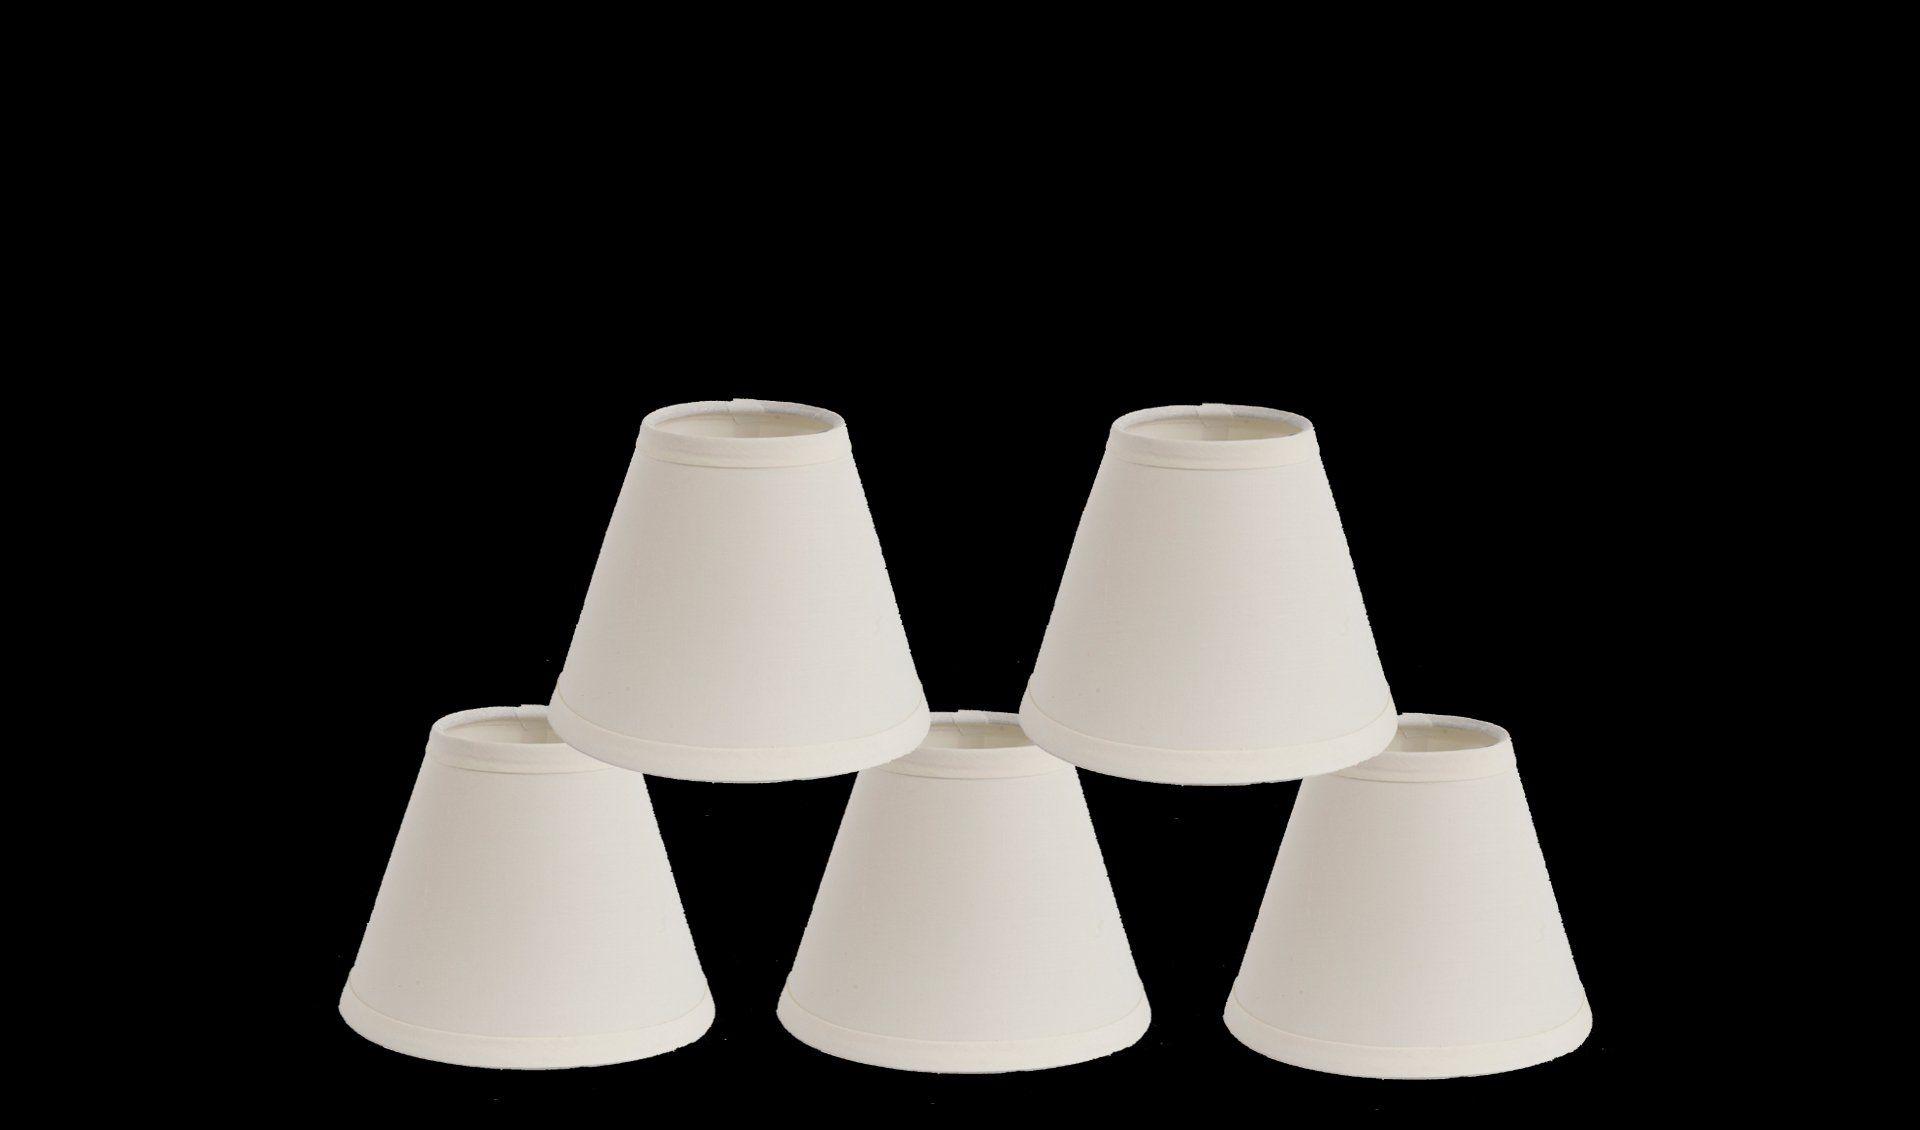 Mini lamp shades - Urbanest 1100327b Mini Chandelier Lamp Shades 6 Inch Cotton Hardback Clip On